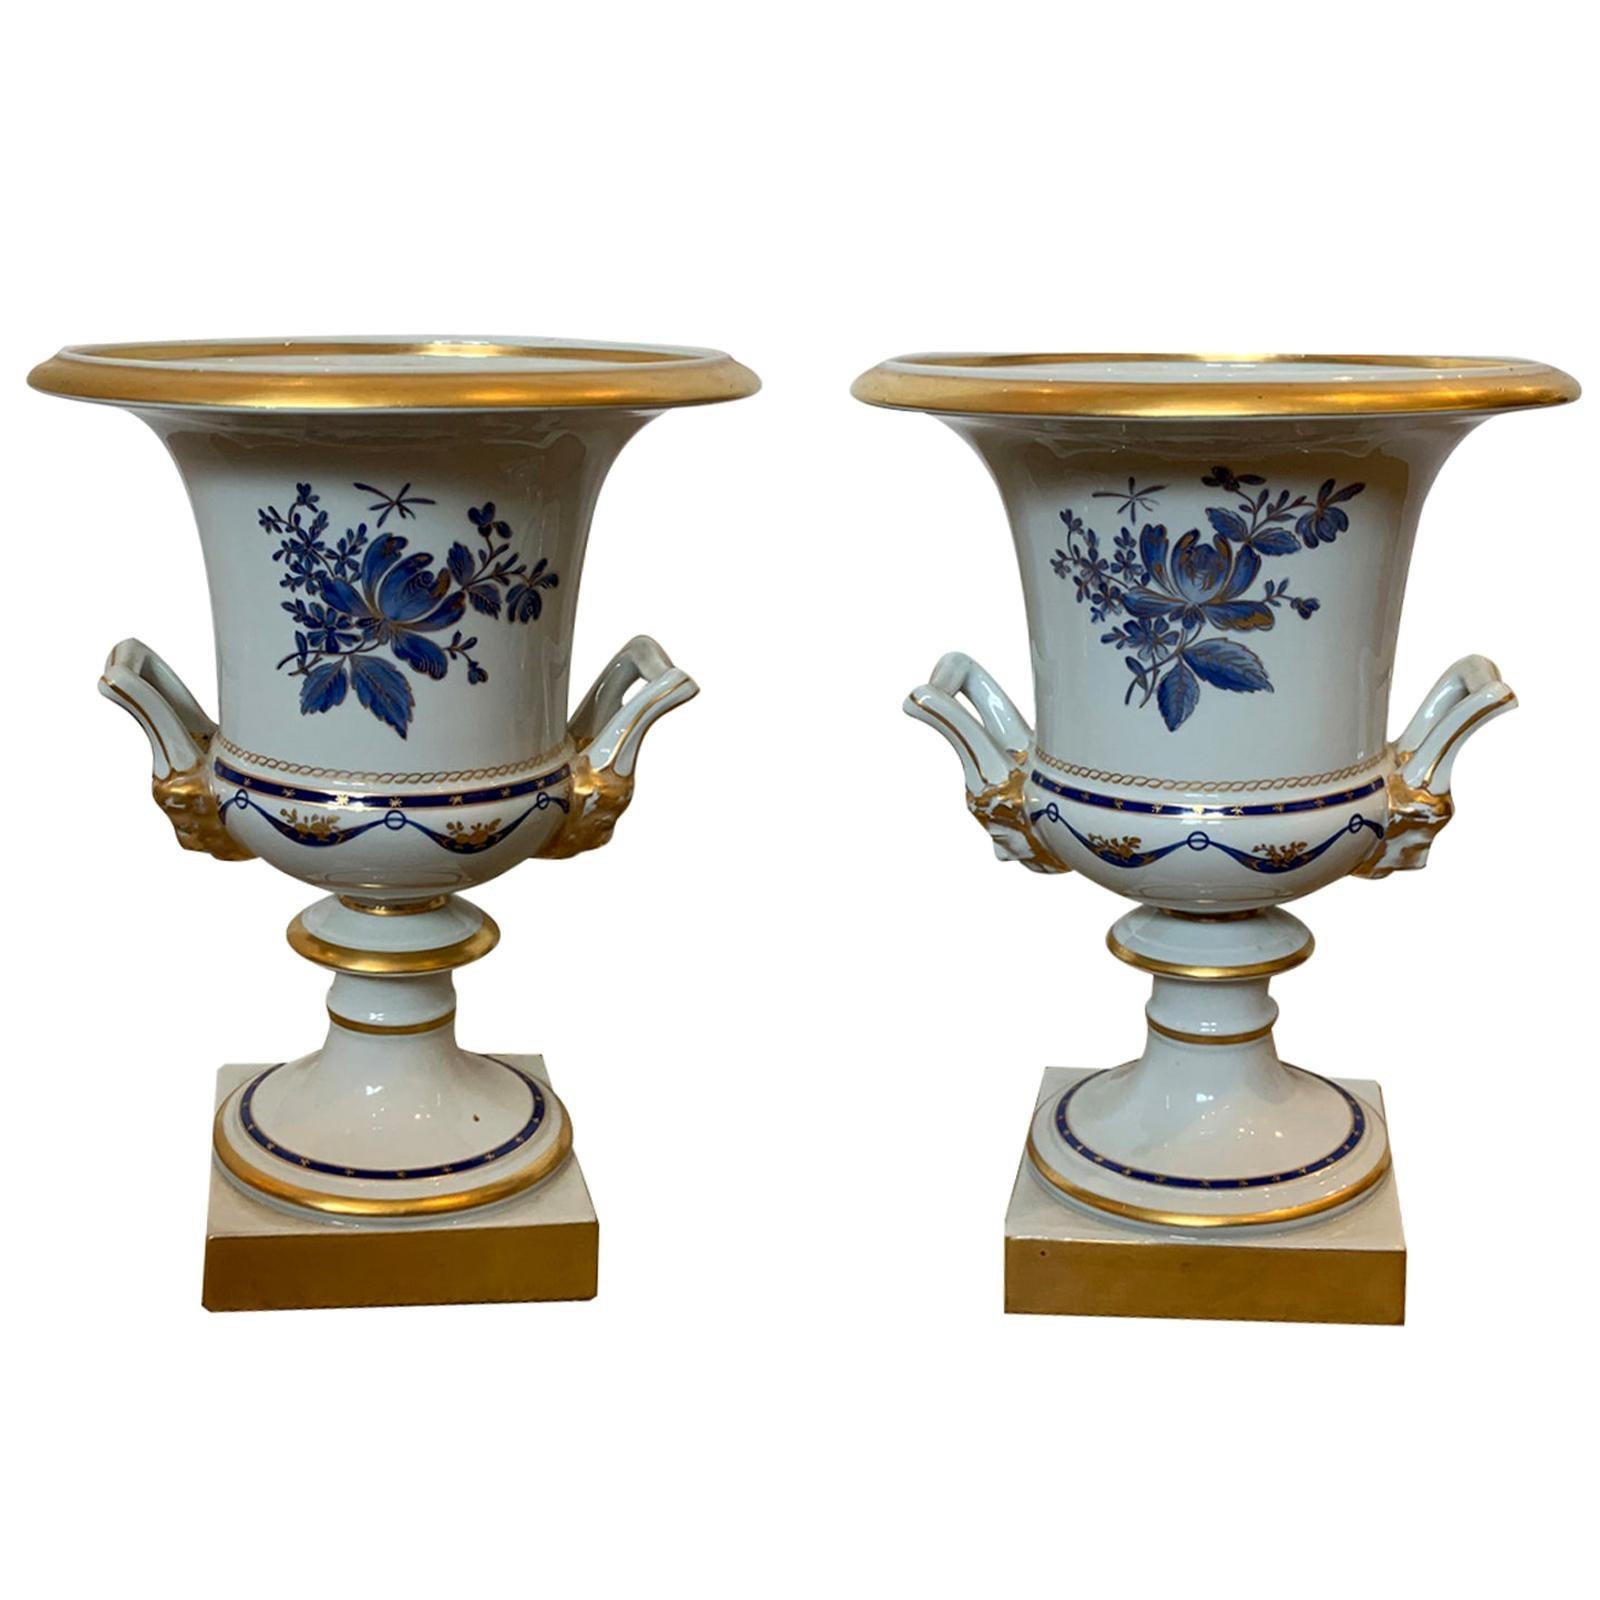 Pair of Vista Alegre Portuguese Blue & White Porcelain Urns, Gilt Details Marked